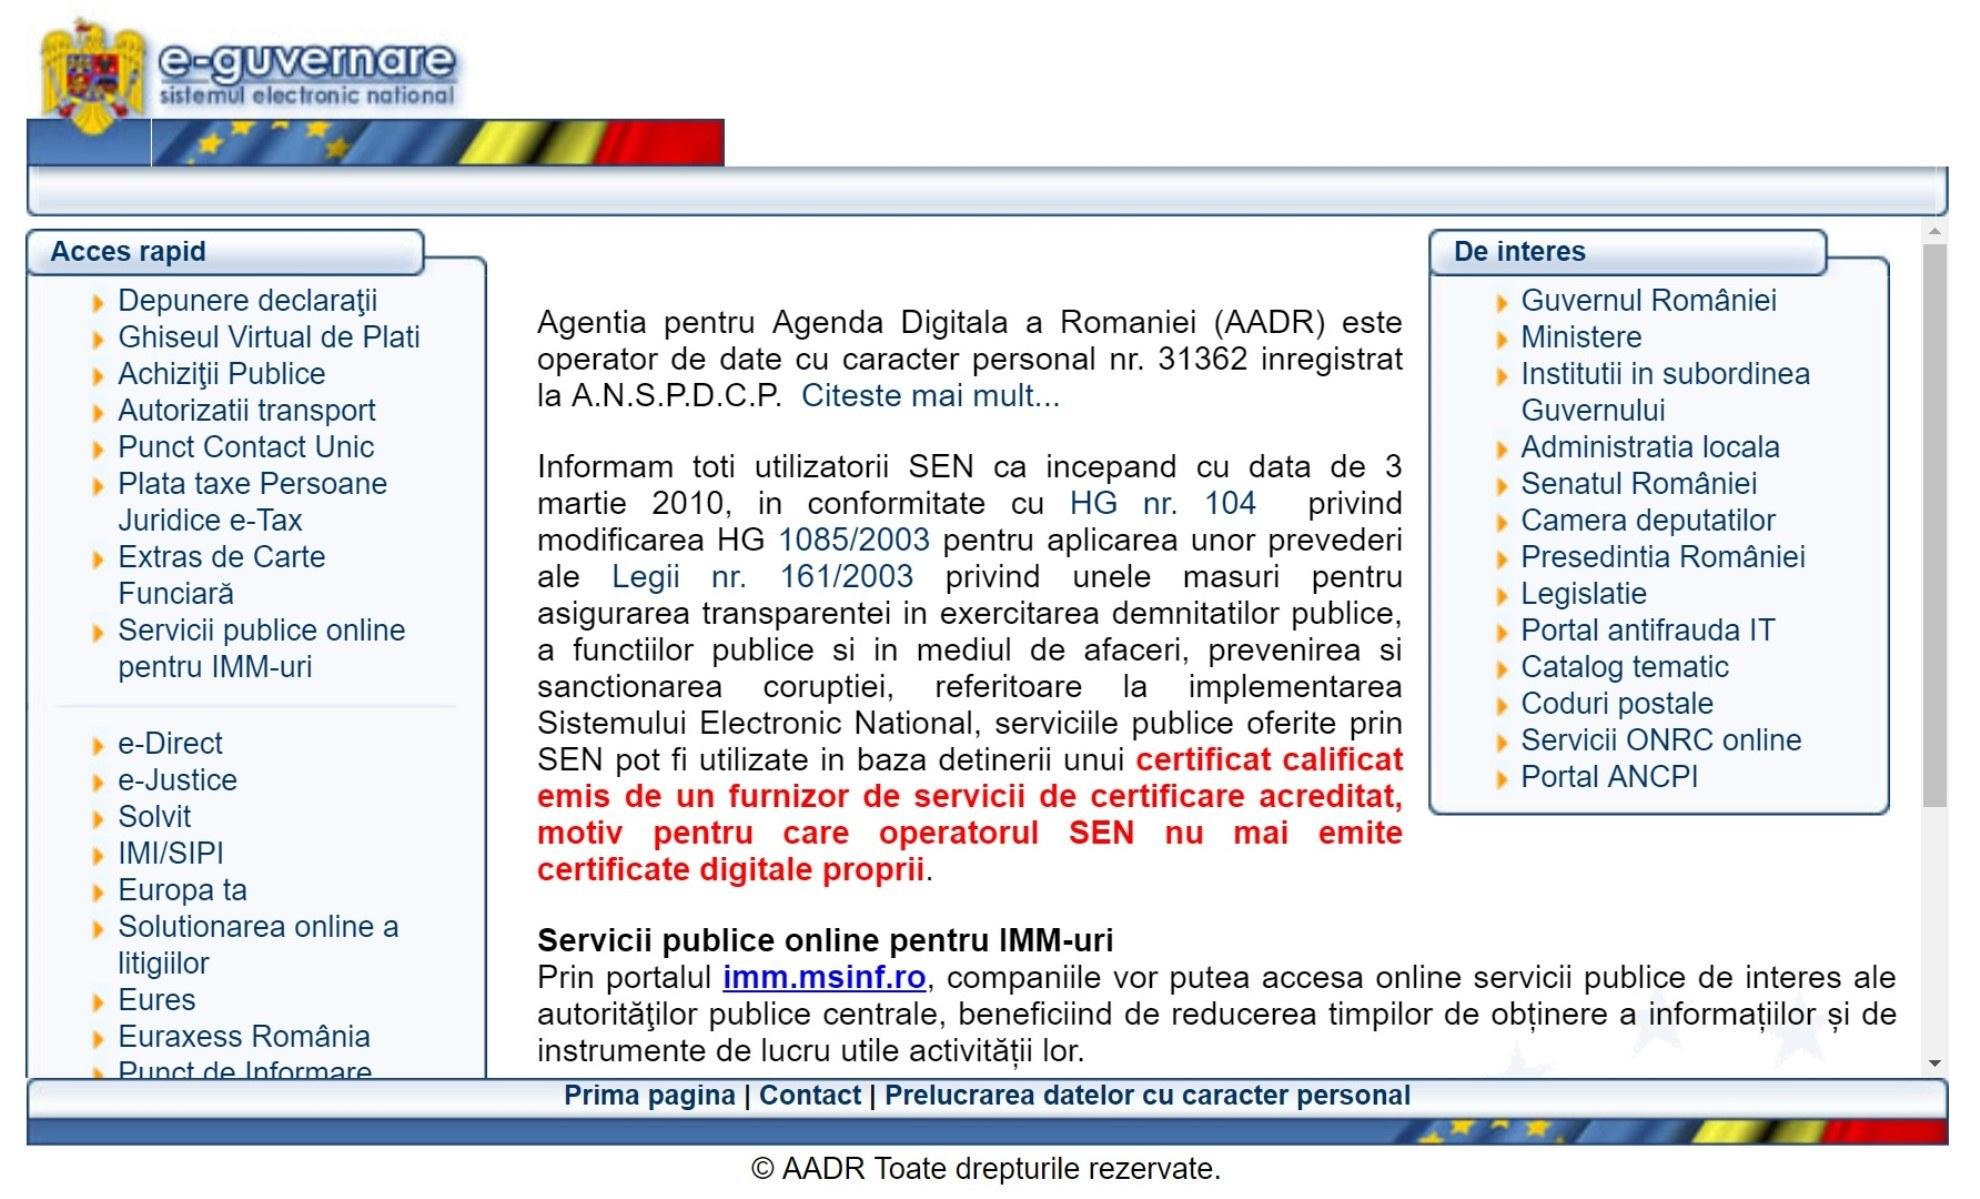 e-guvernare sistemul electronic national